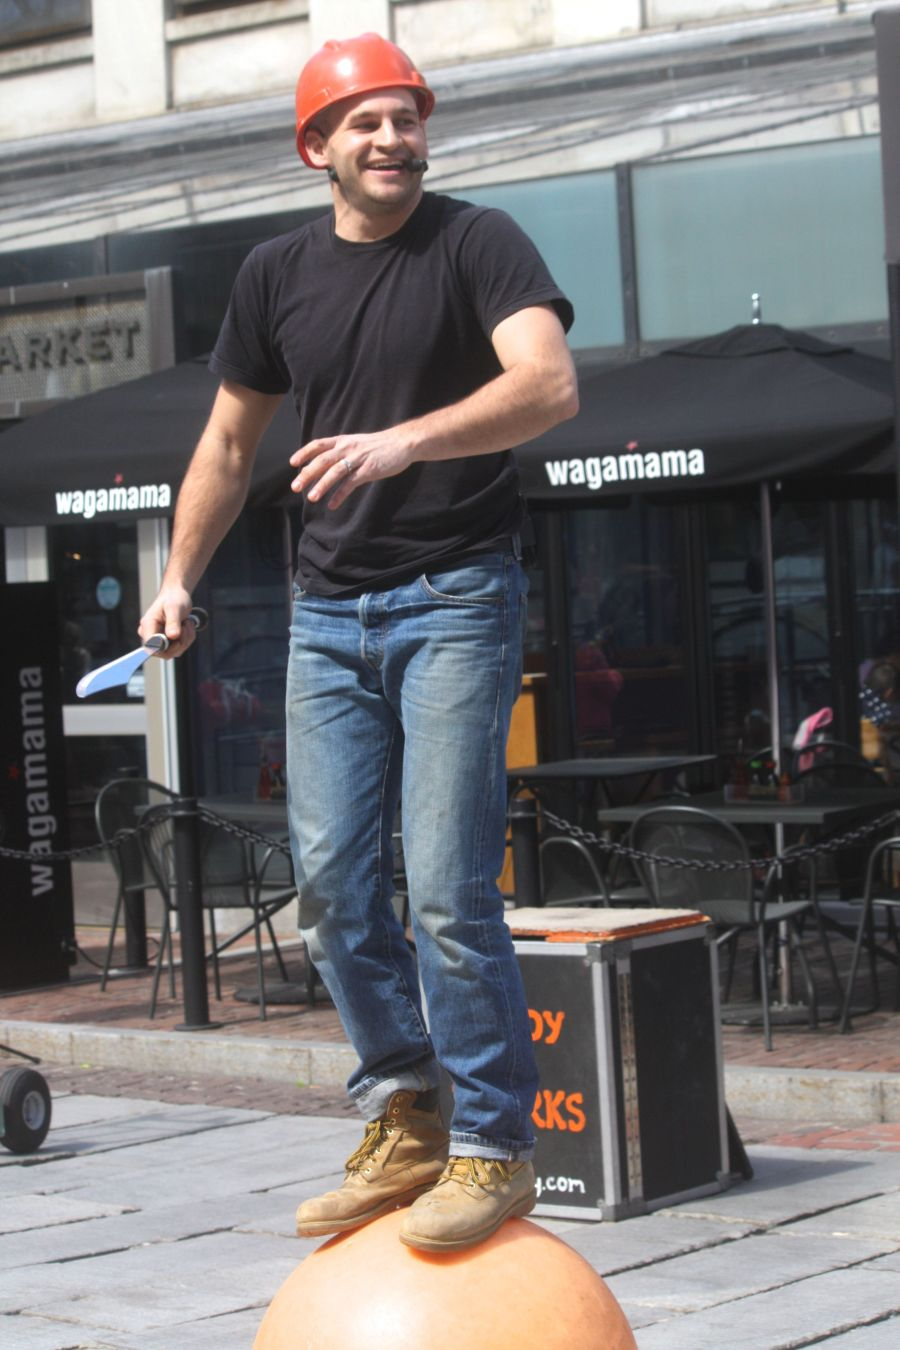 boston faneuil hall brett mccoy real mccoy comedy that works street performer 2